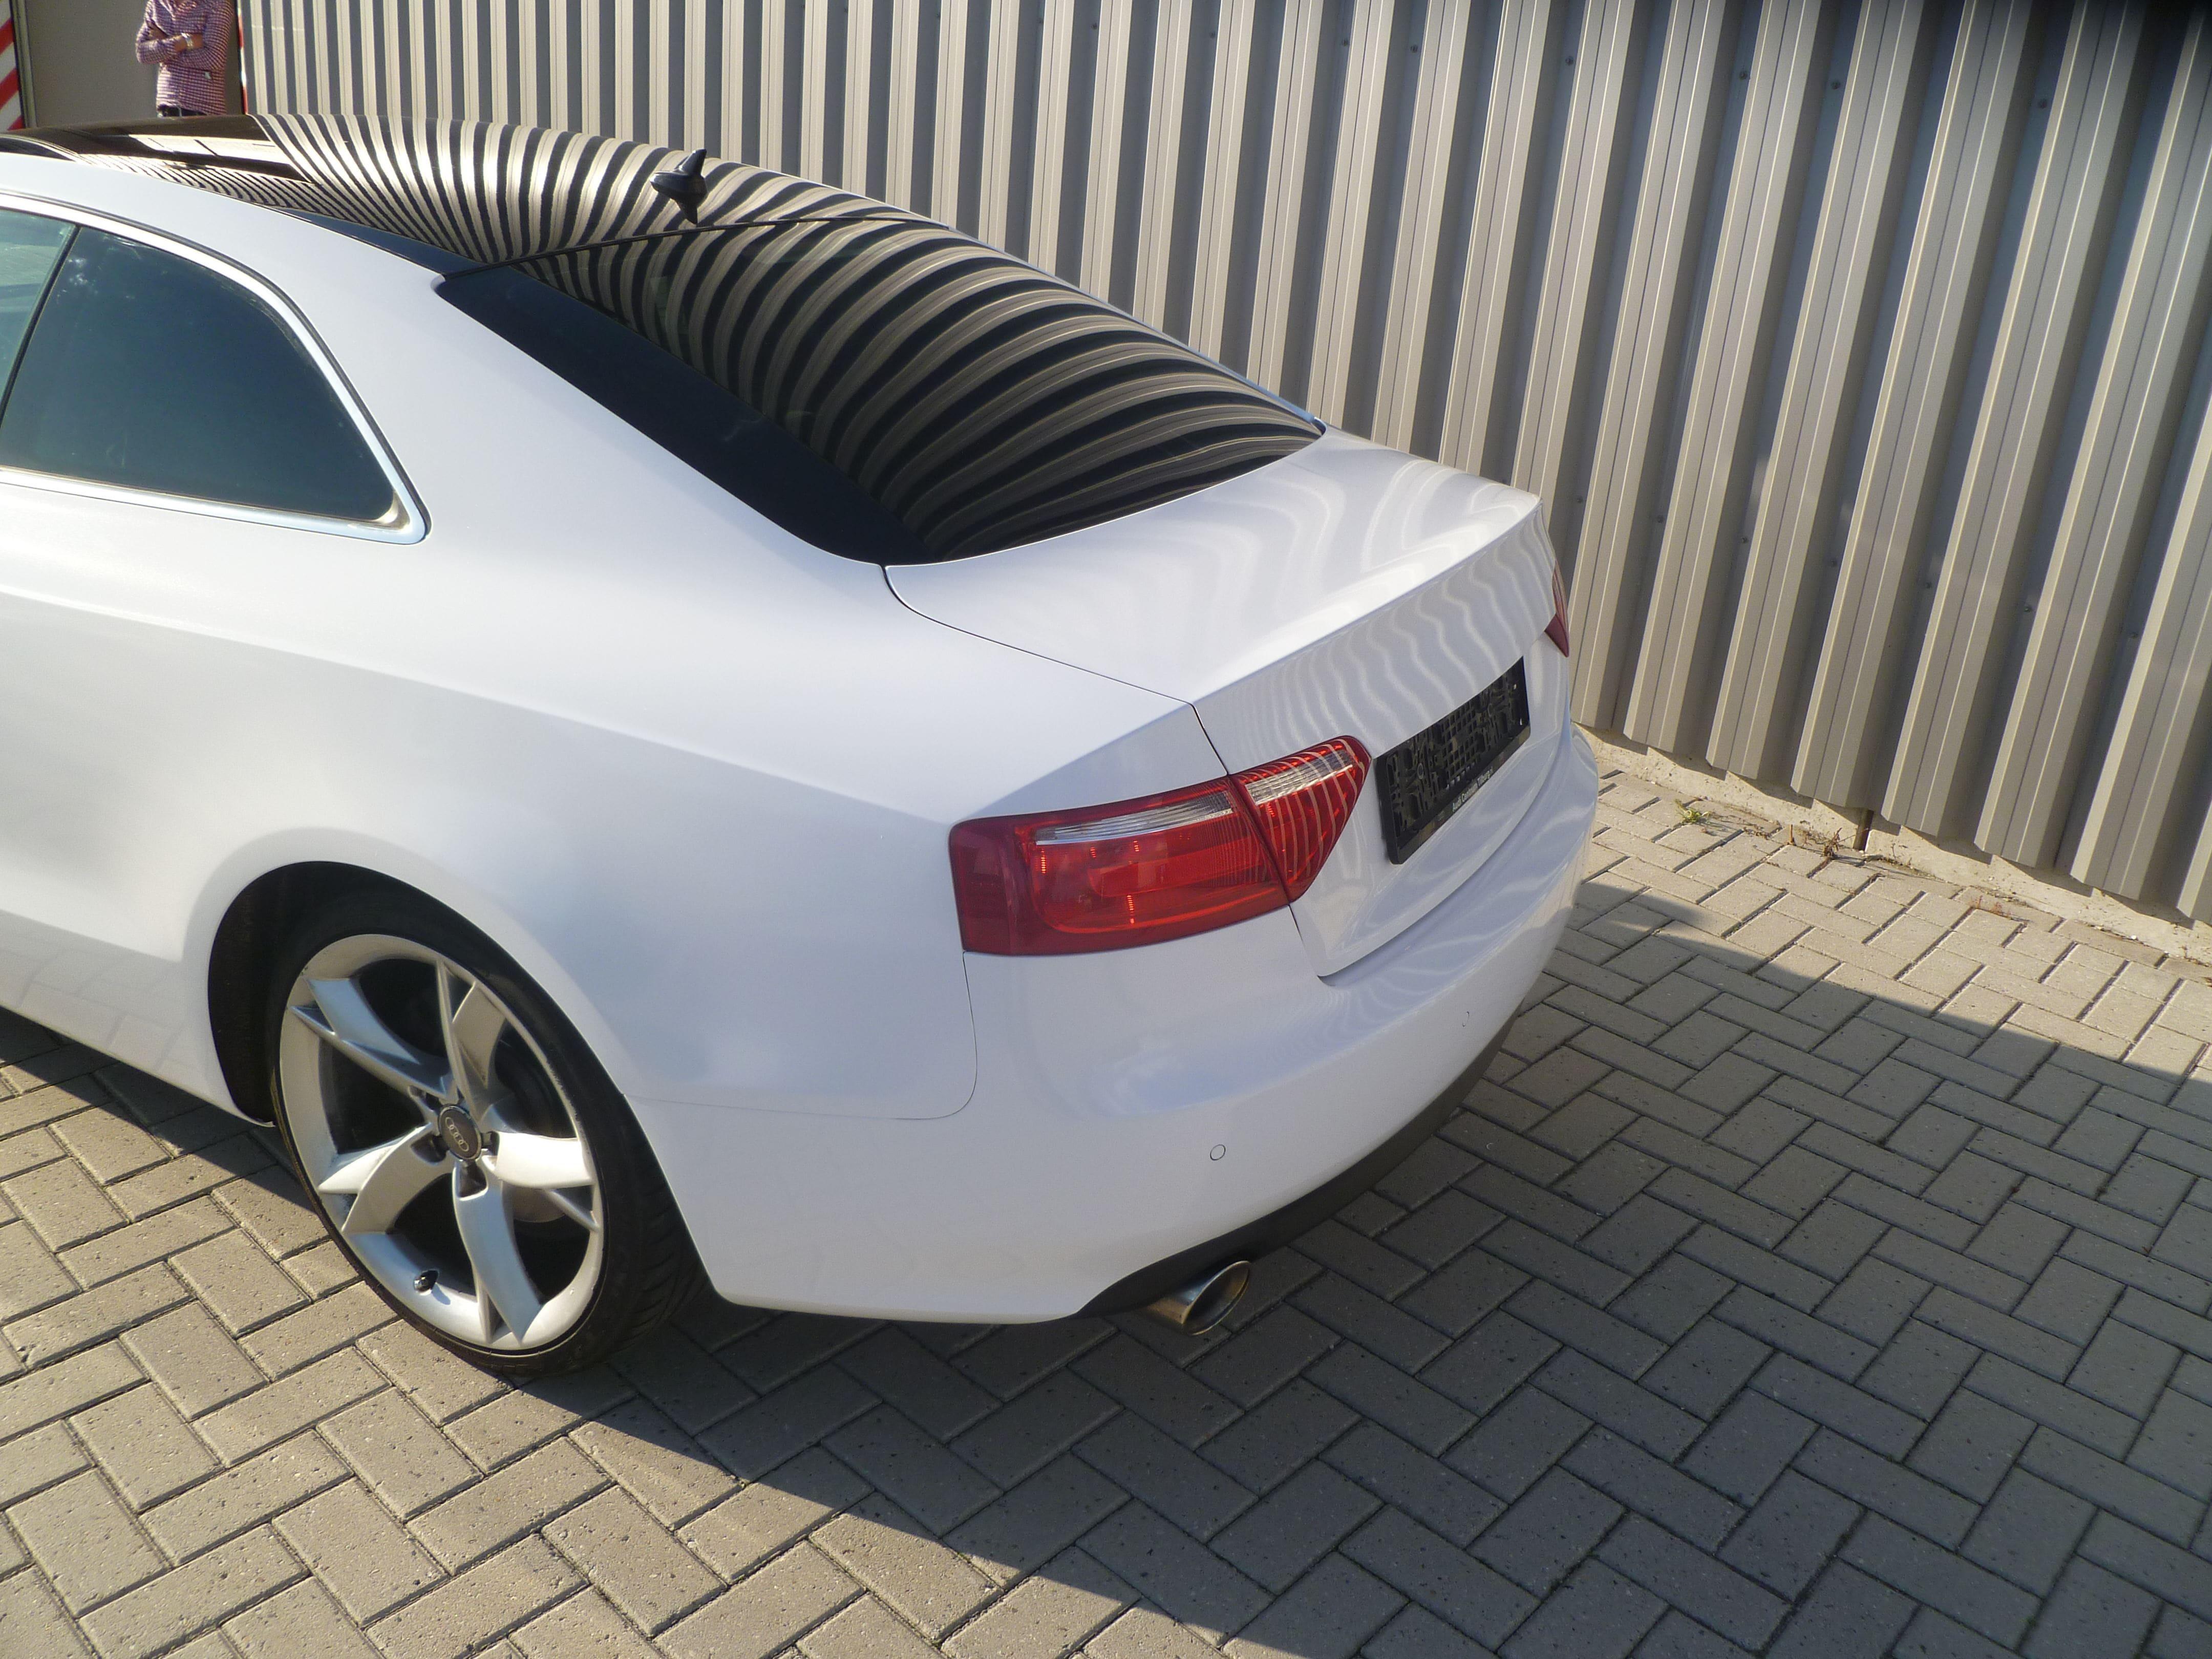 Audi A5 coupe met Metallic Witte Wrap, Carwrapping door Wrapmyride.nu Foto-nr:4747, ©2021